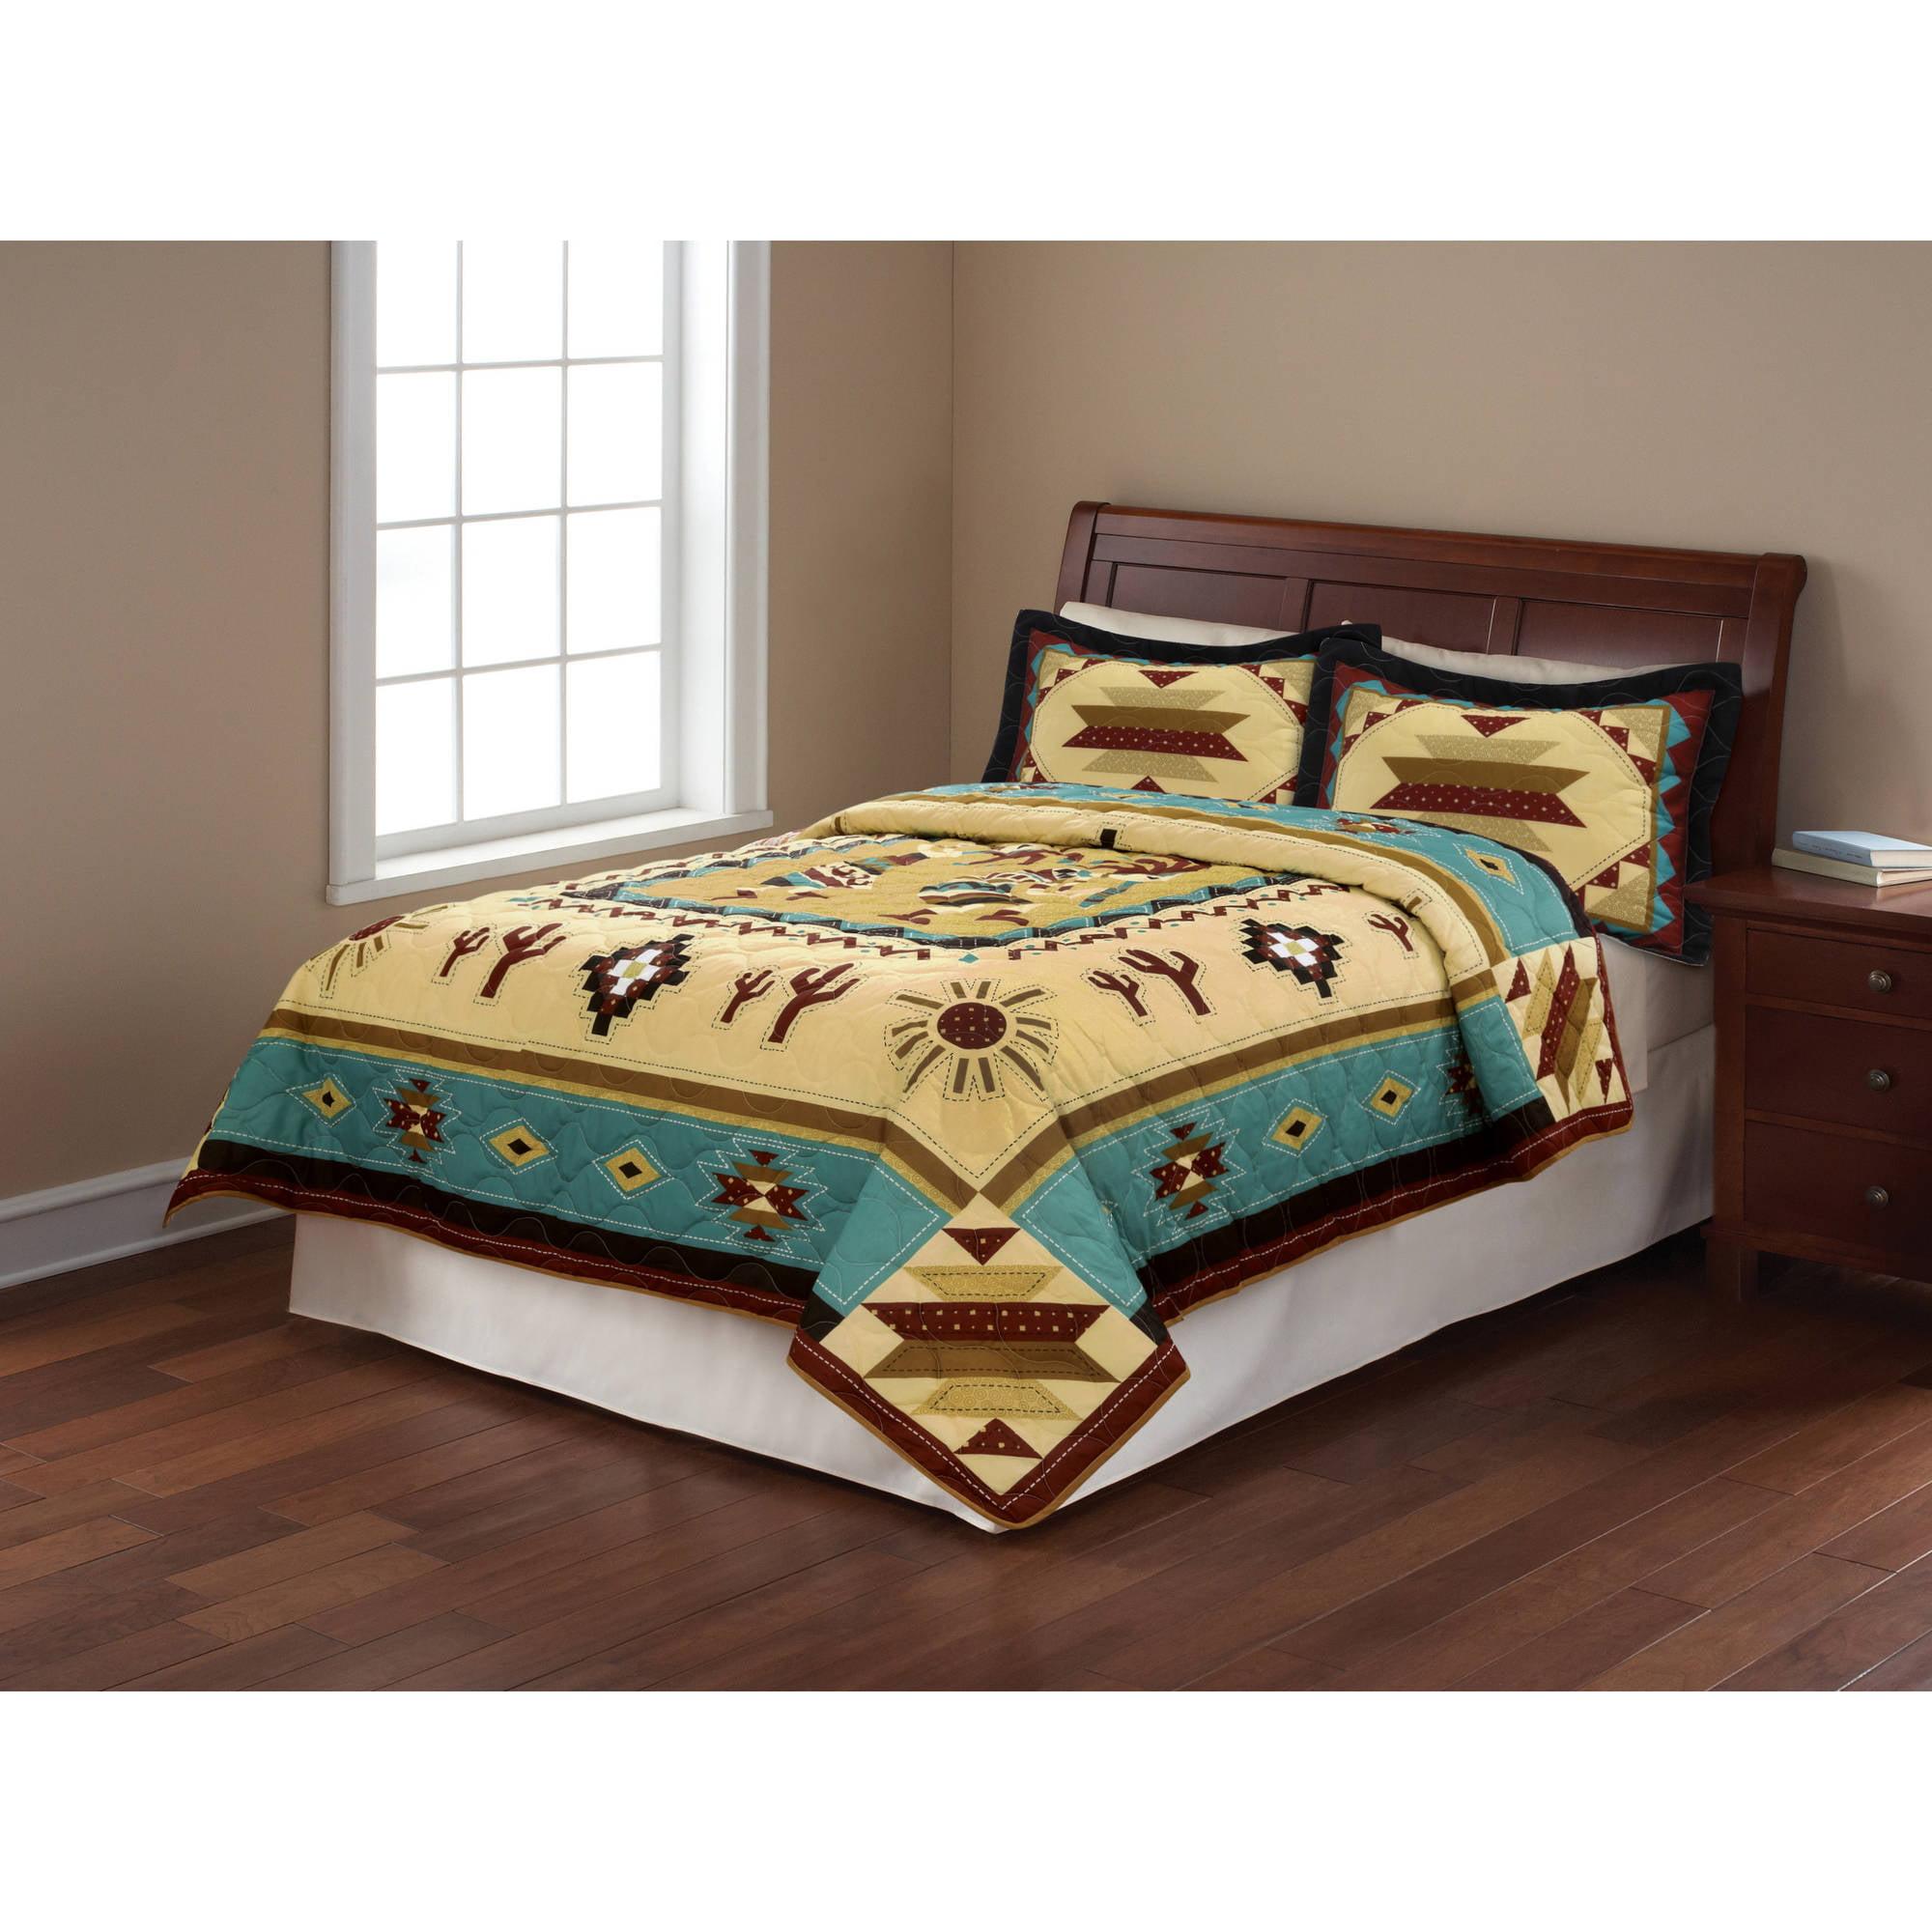 comforter southwest themed set southwestern comforters